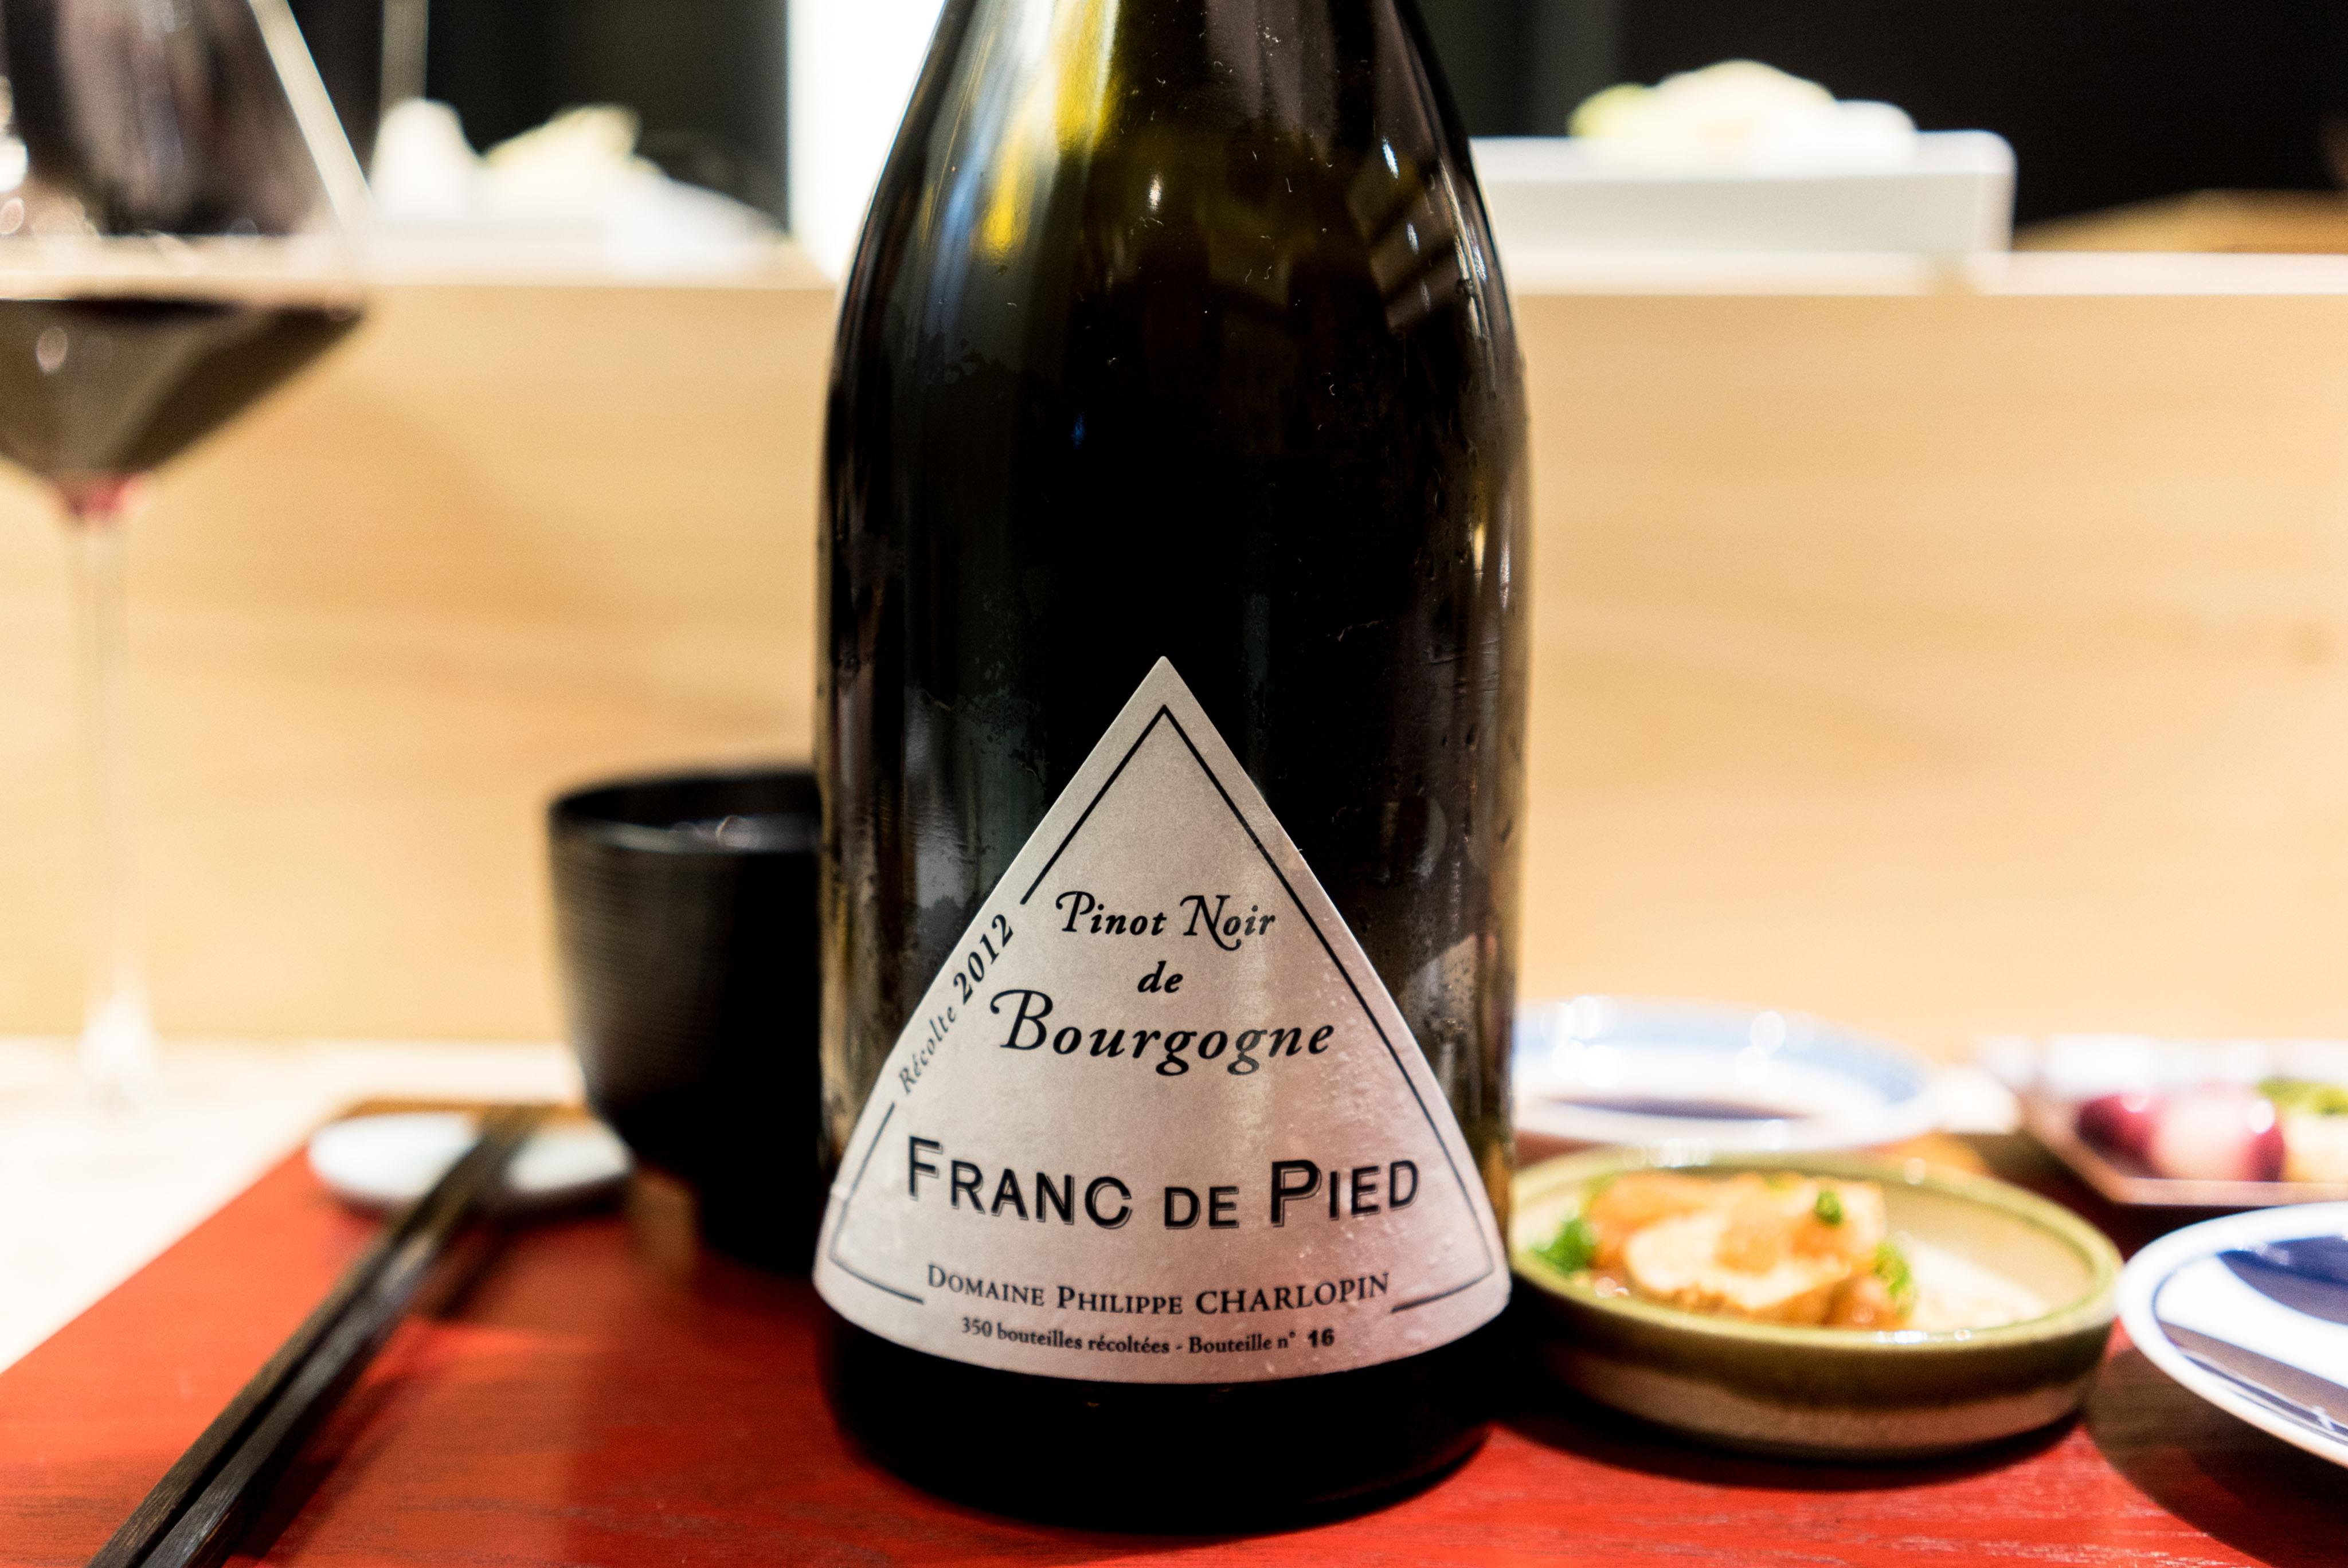 Bourgogne Franc de Pied Philippe Charlopin-Parizot 2012